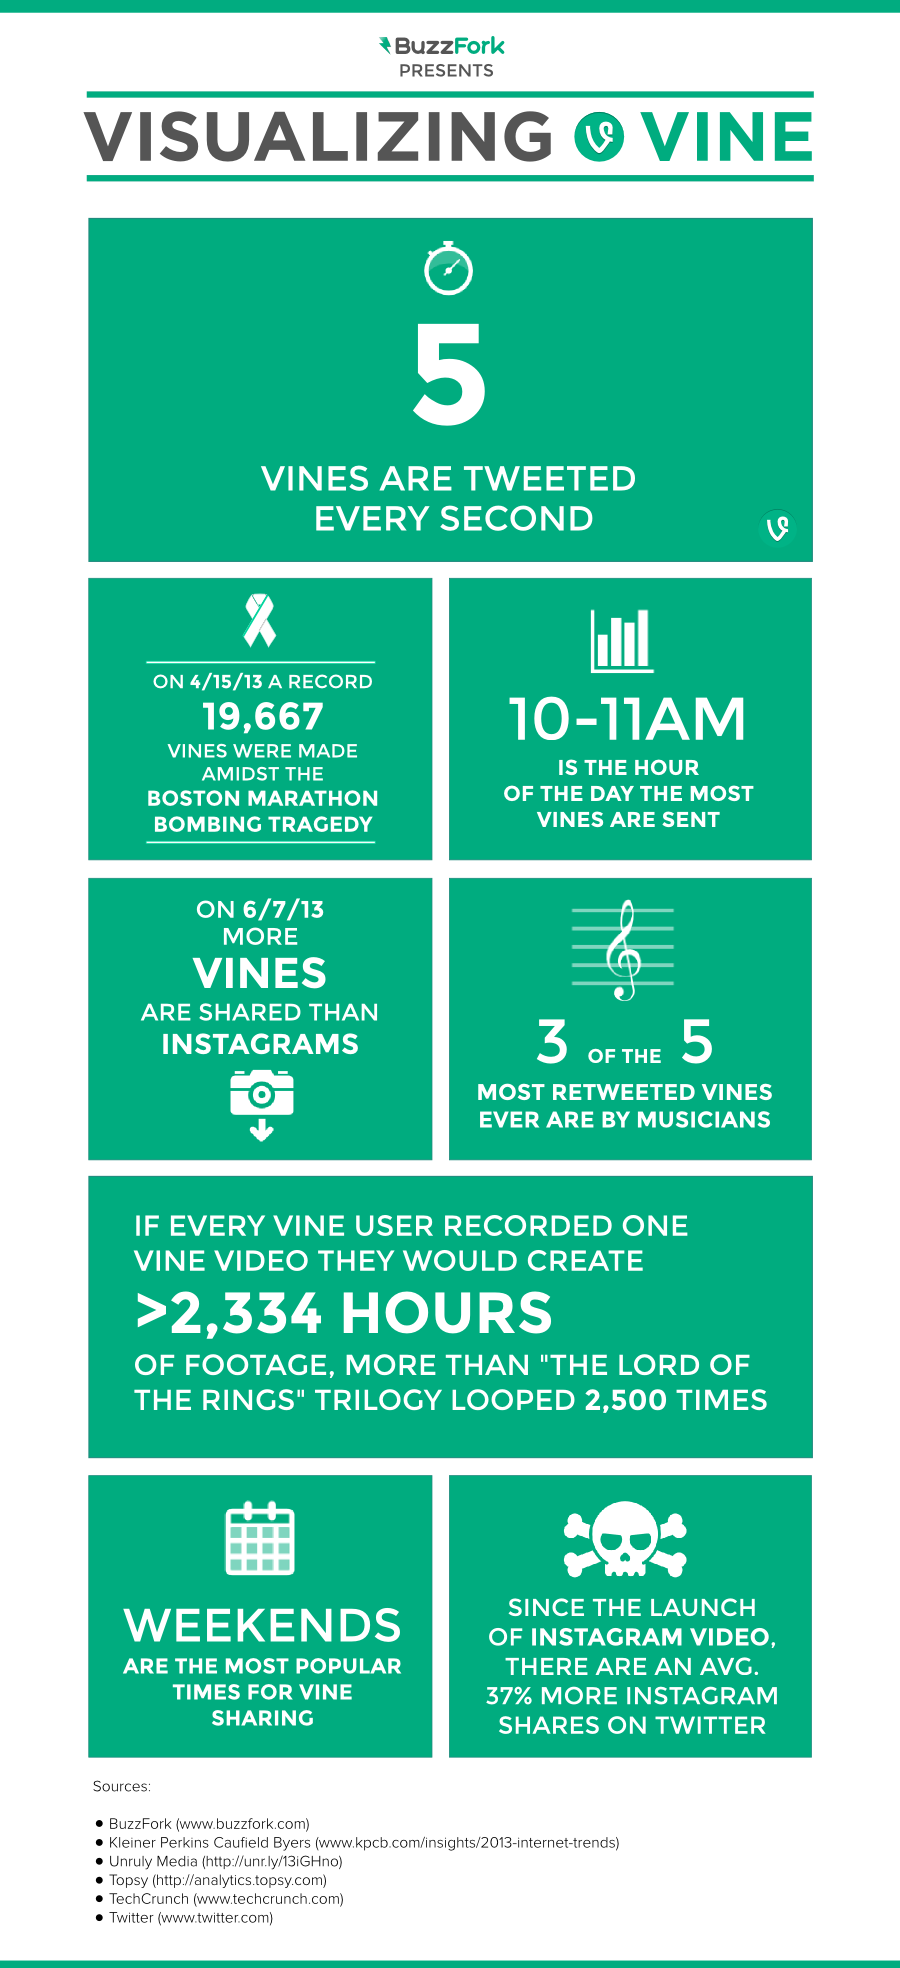 Visualizing vine infographic